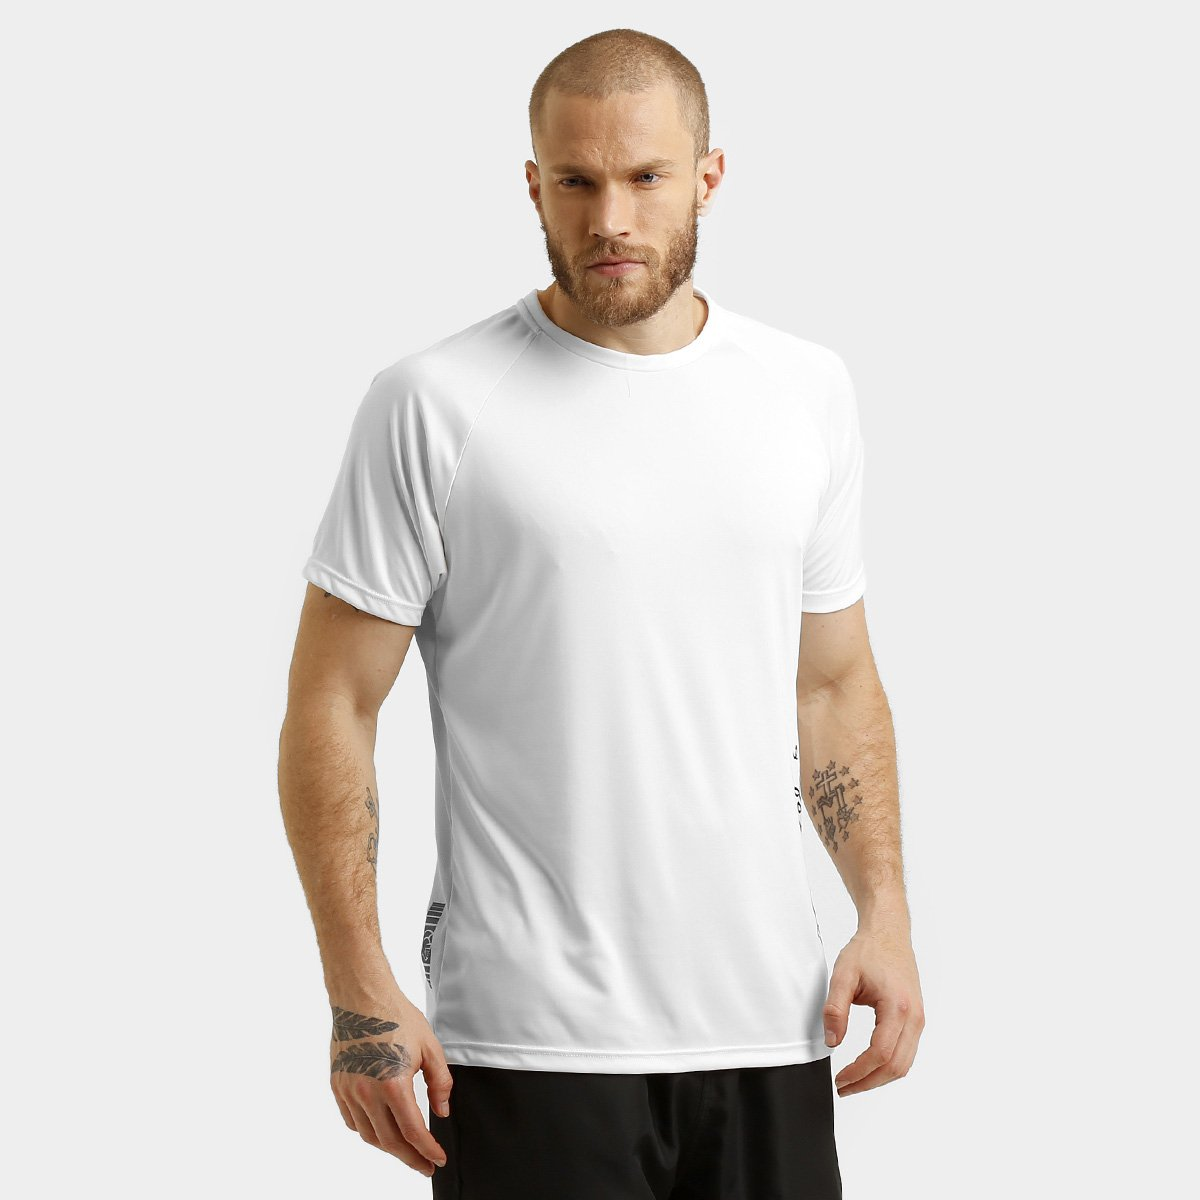 9e0e481b2f Camiseta Pretorian Handmade Masculina